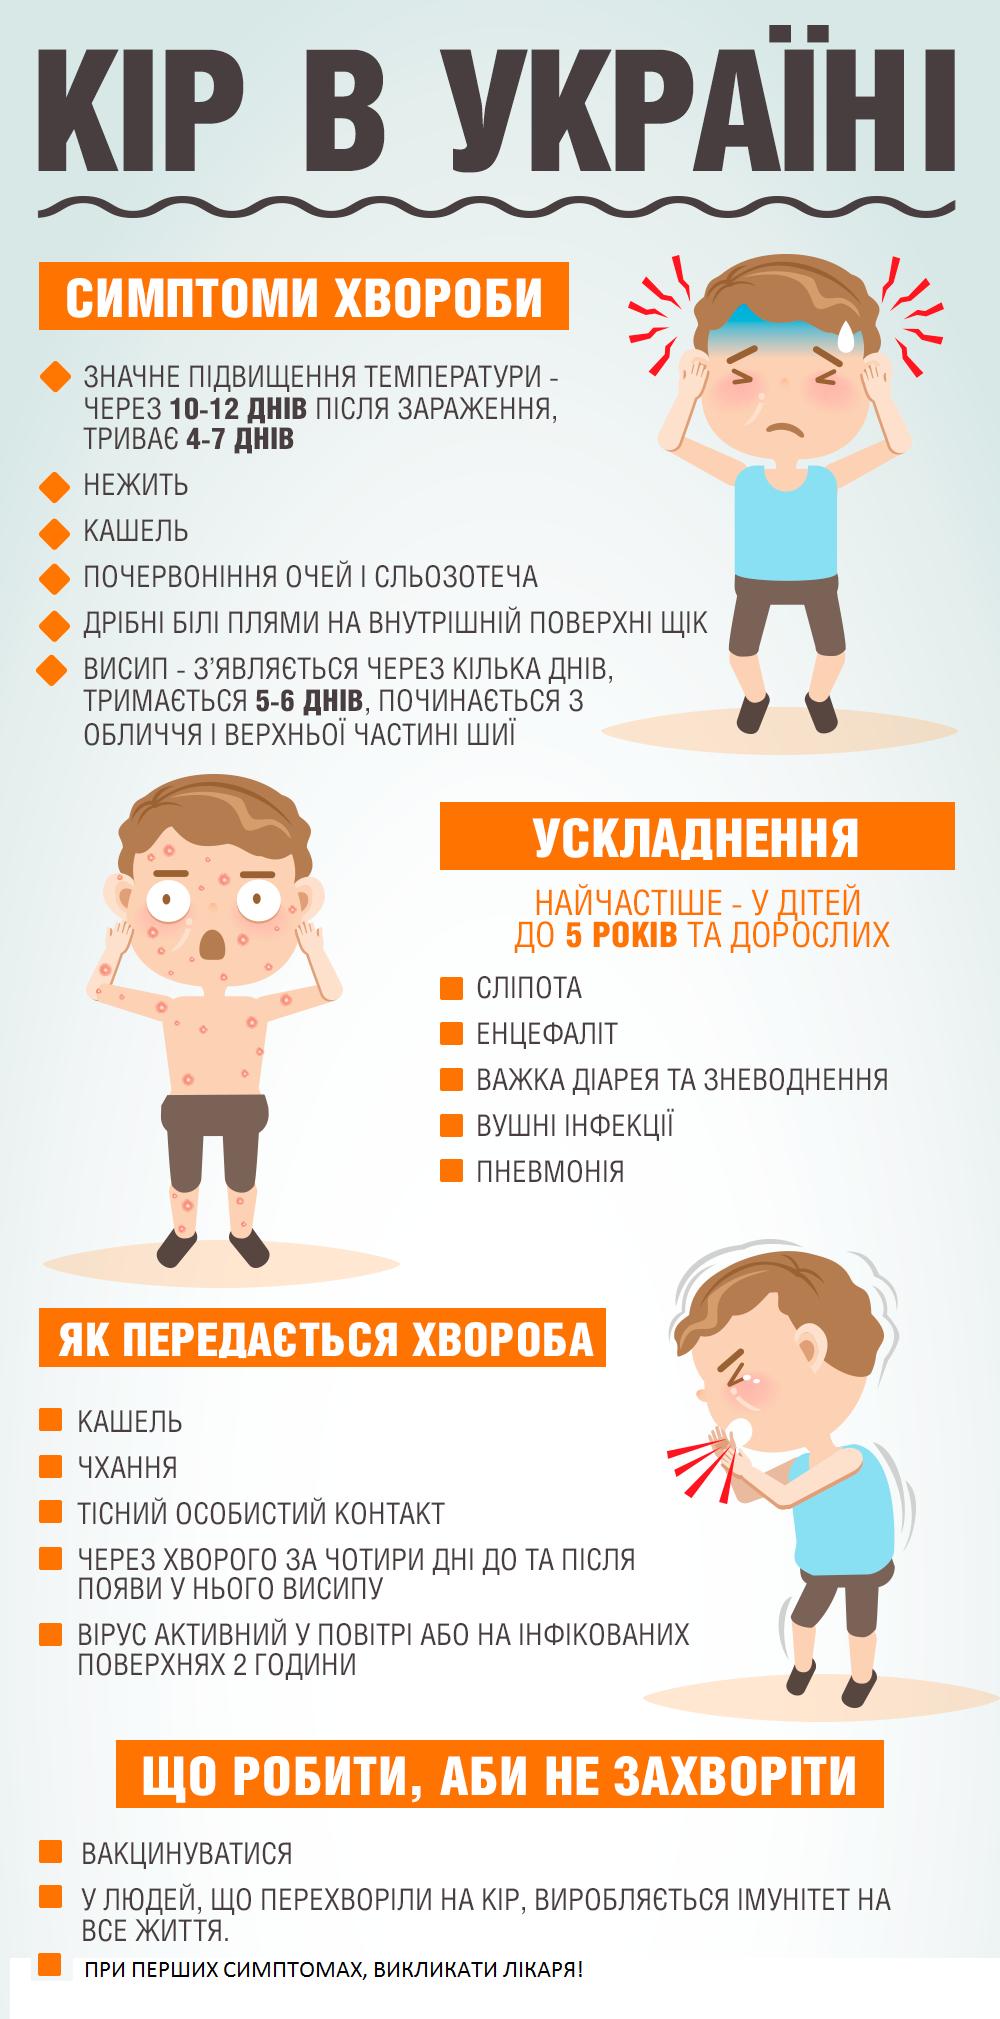 Kir-v-Ukrayini ГП№8